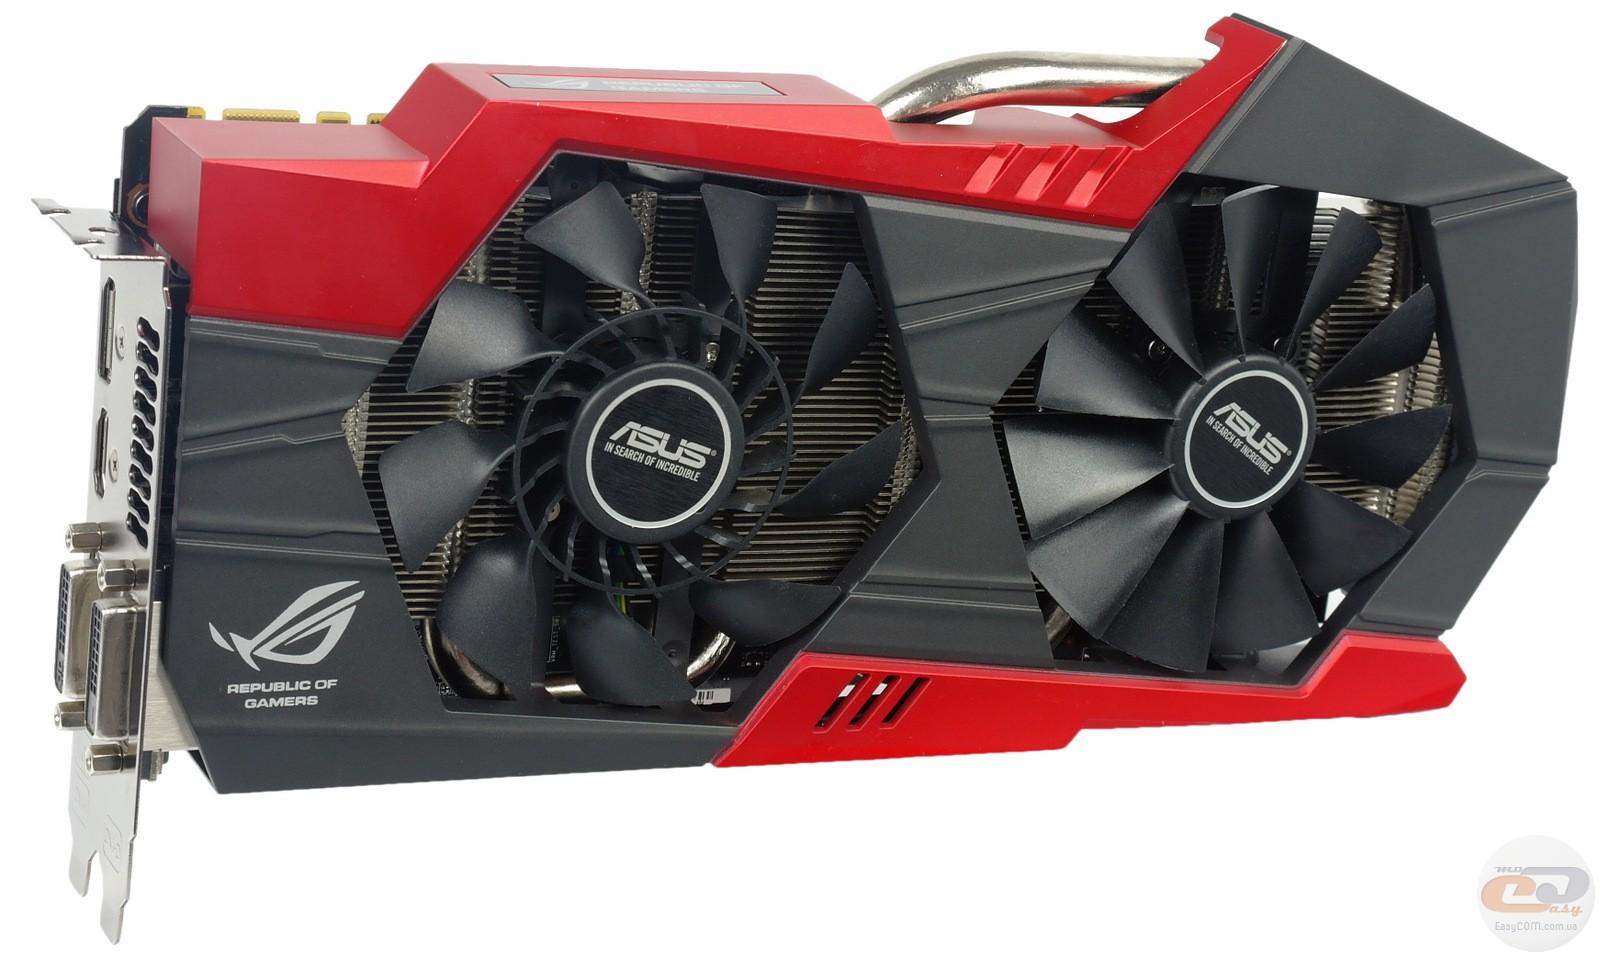 ASUS GeForce GTX 760 STRIKER PLATINUM review and ...